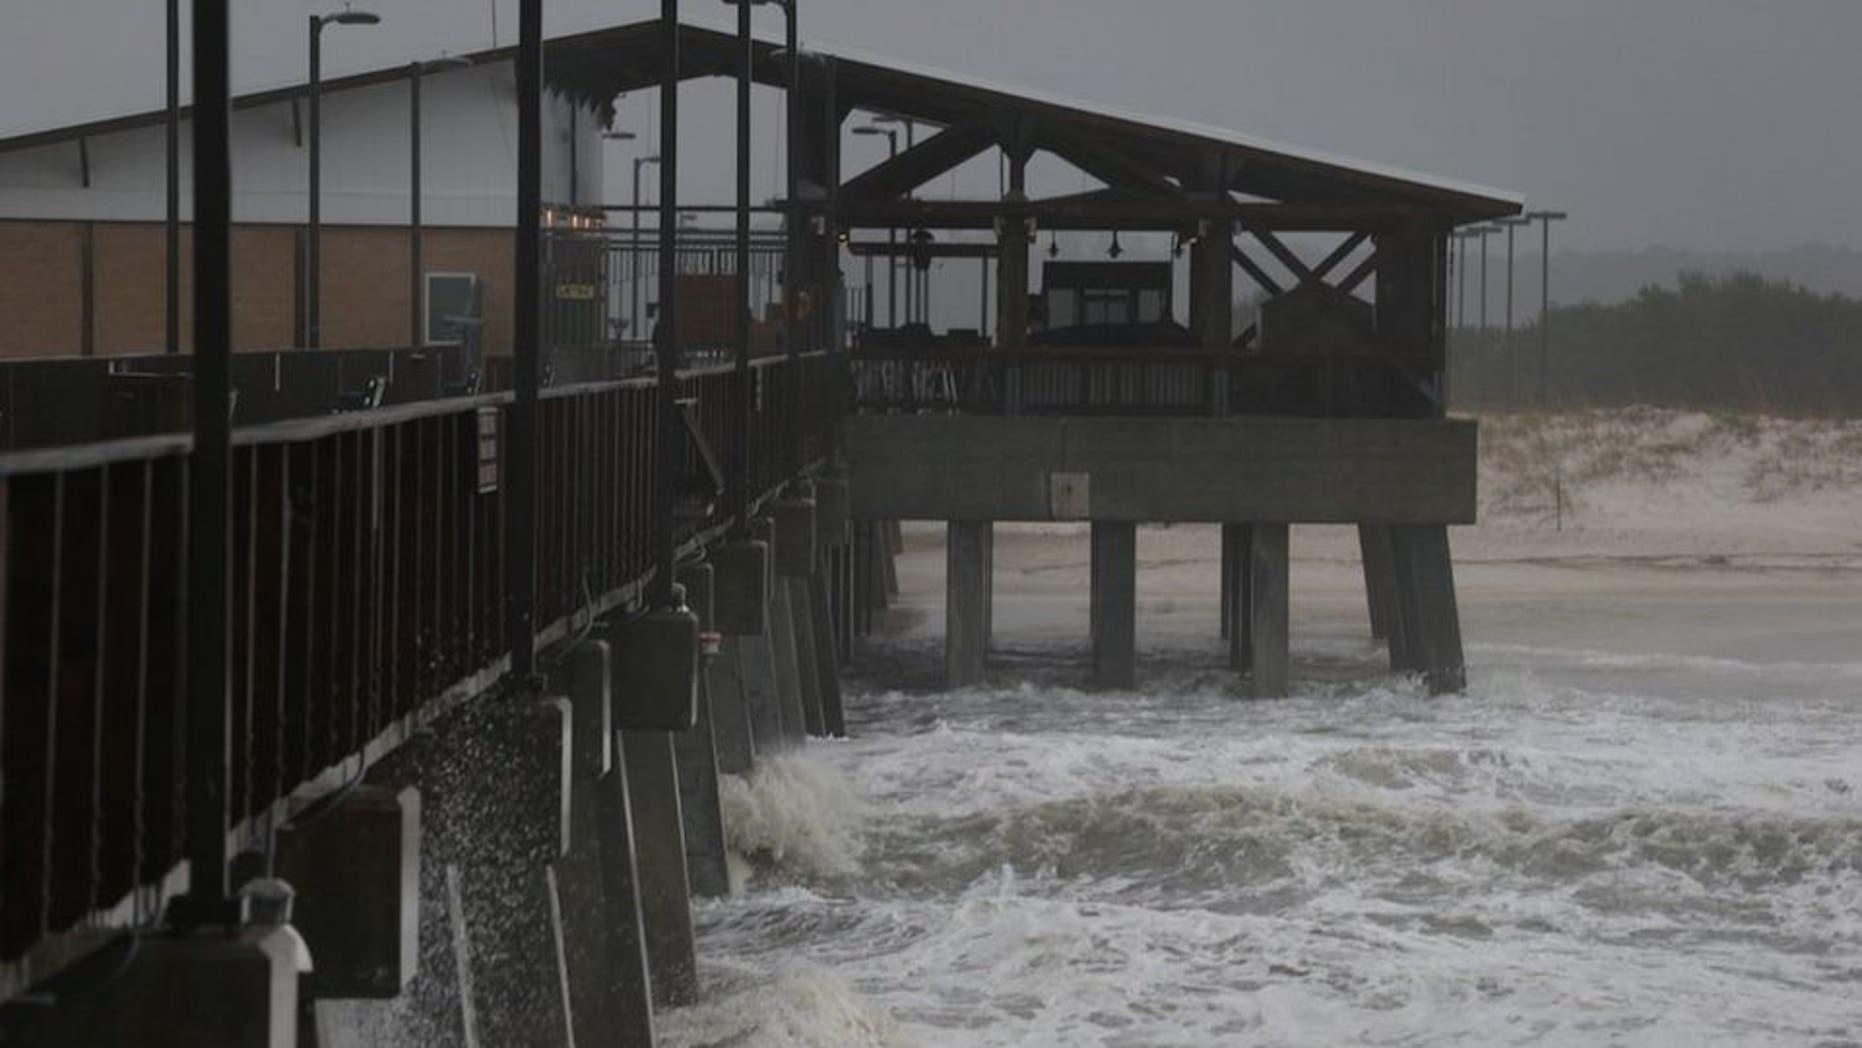 The remnants of Hurricane Patricia striking Gulf Shores, Alabama Monday. (Brian Kelly/Mobile Press-Register via AP)